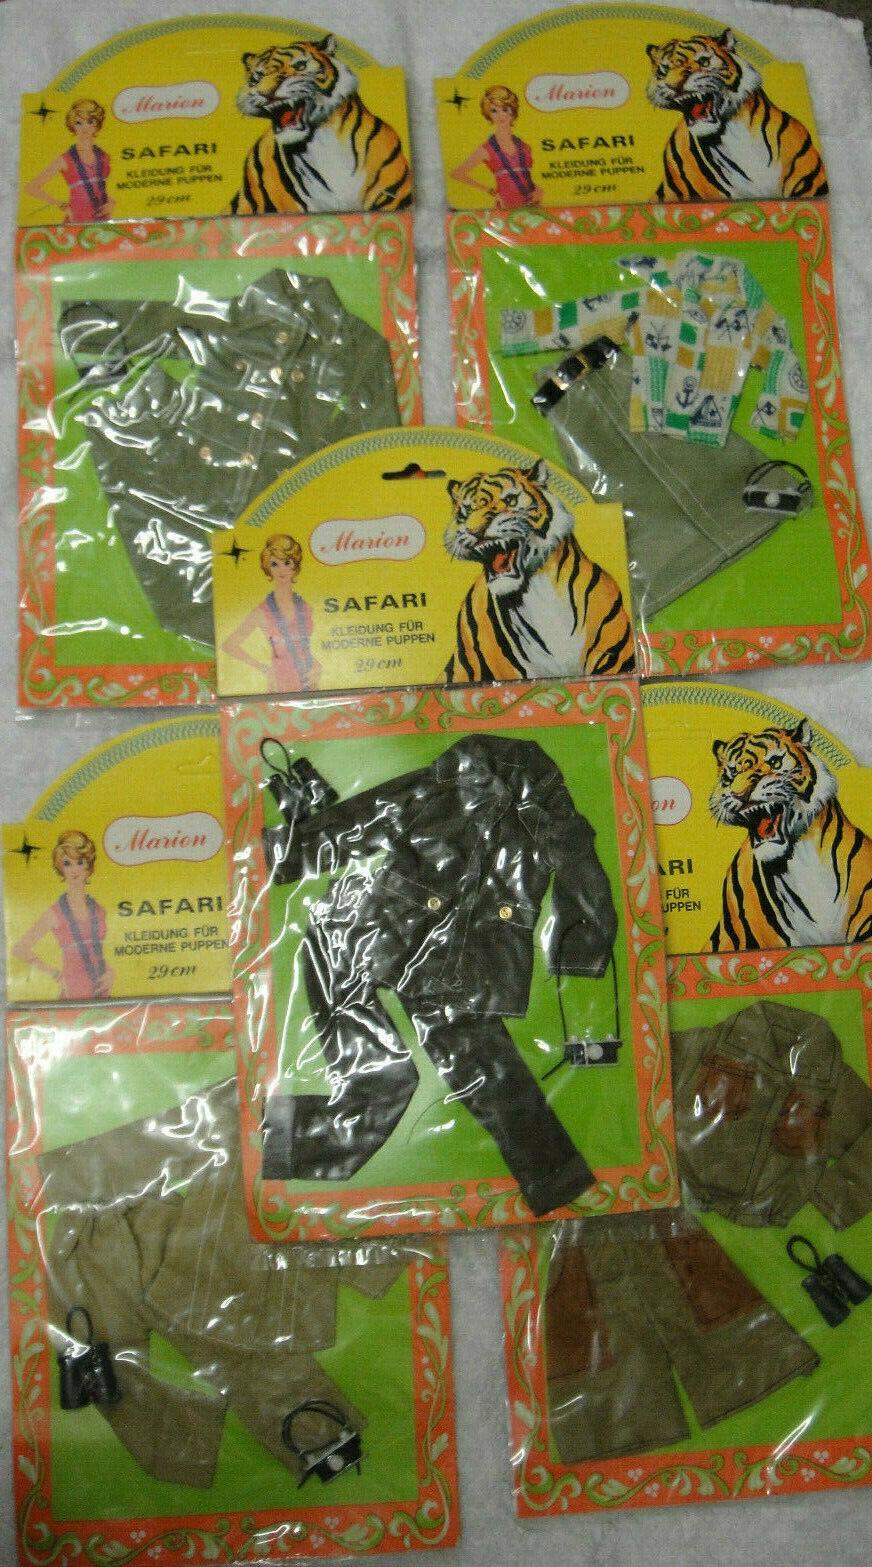 VINTAGE Marion Fashion Doll Set  Safari vestiti per bambole moderno 29cm 5 Set